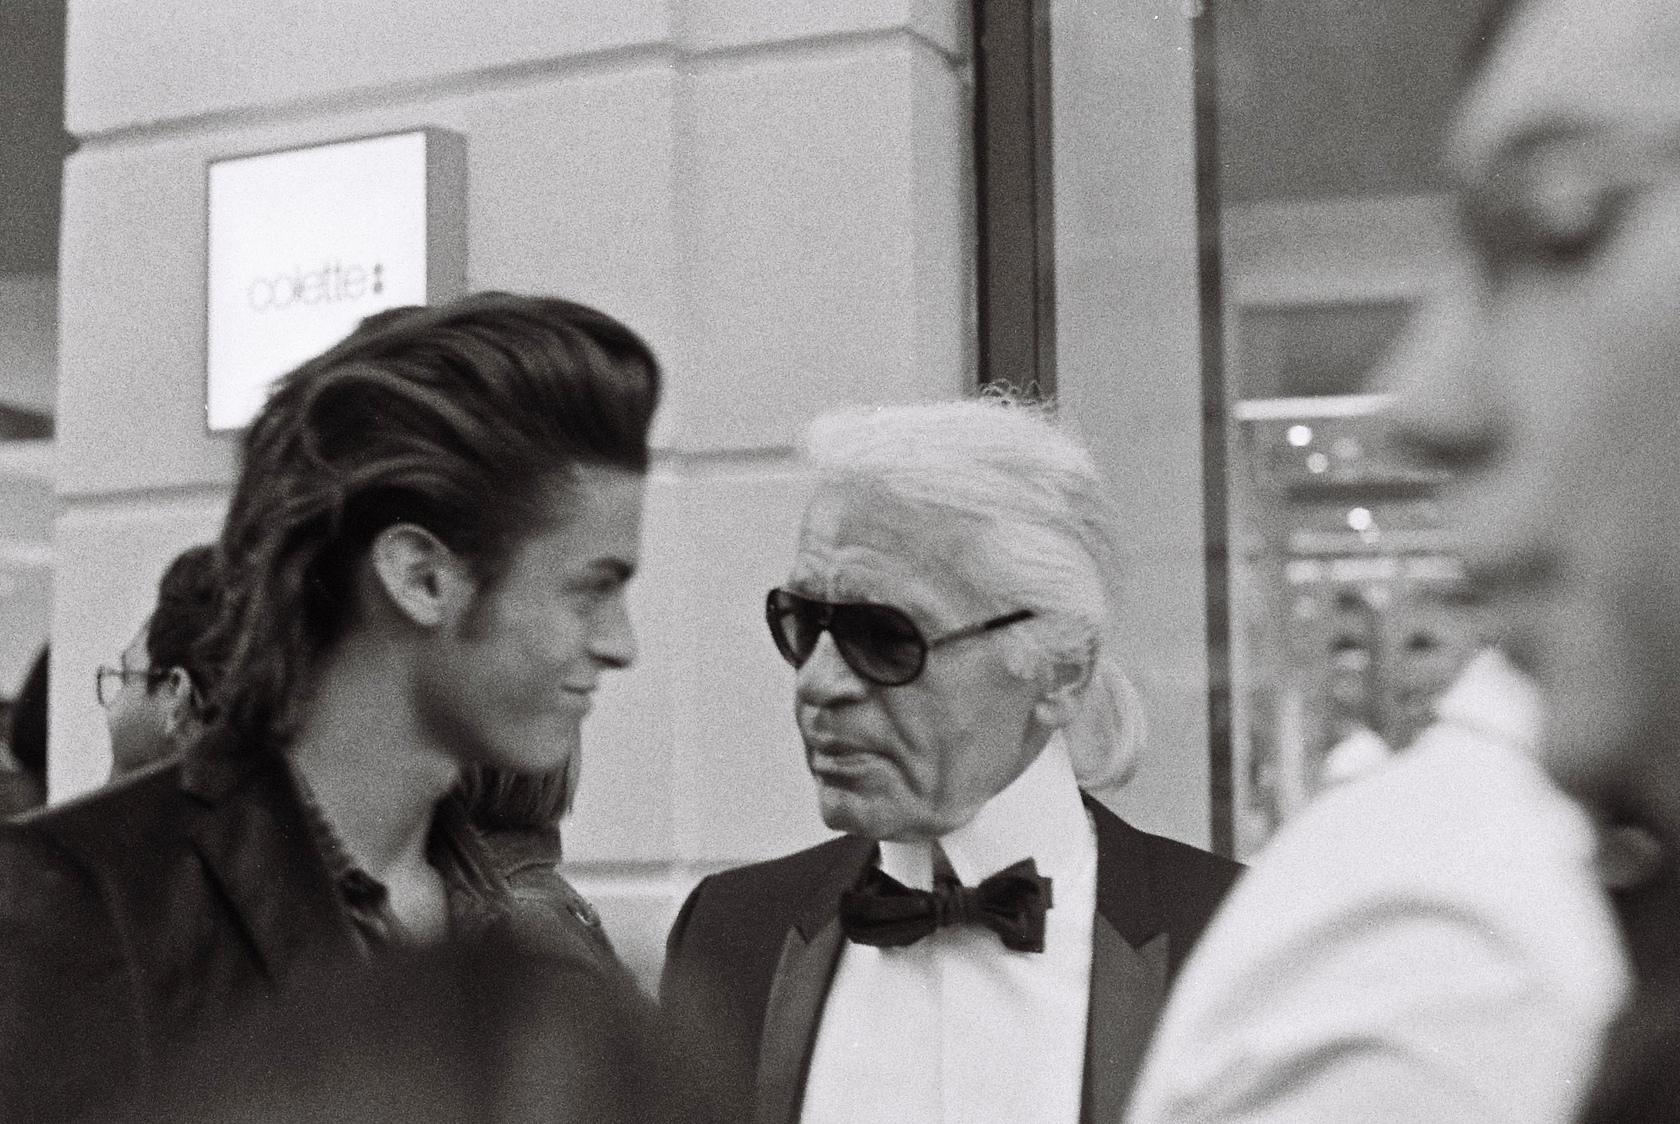 Karl Lagerfeld, Chanel, fashion, mode, design